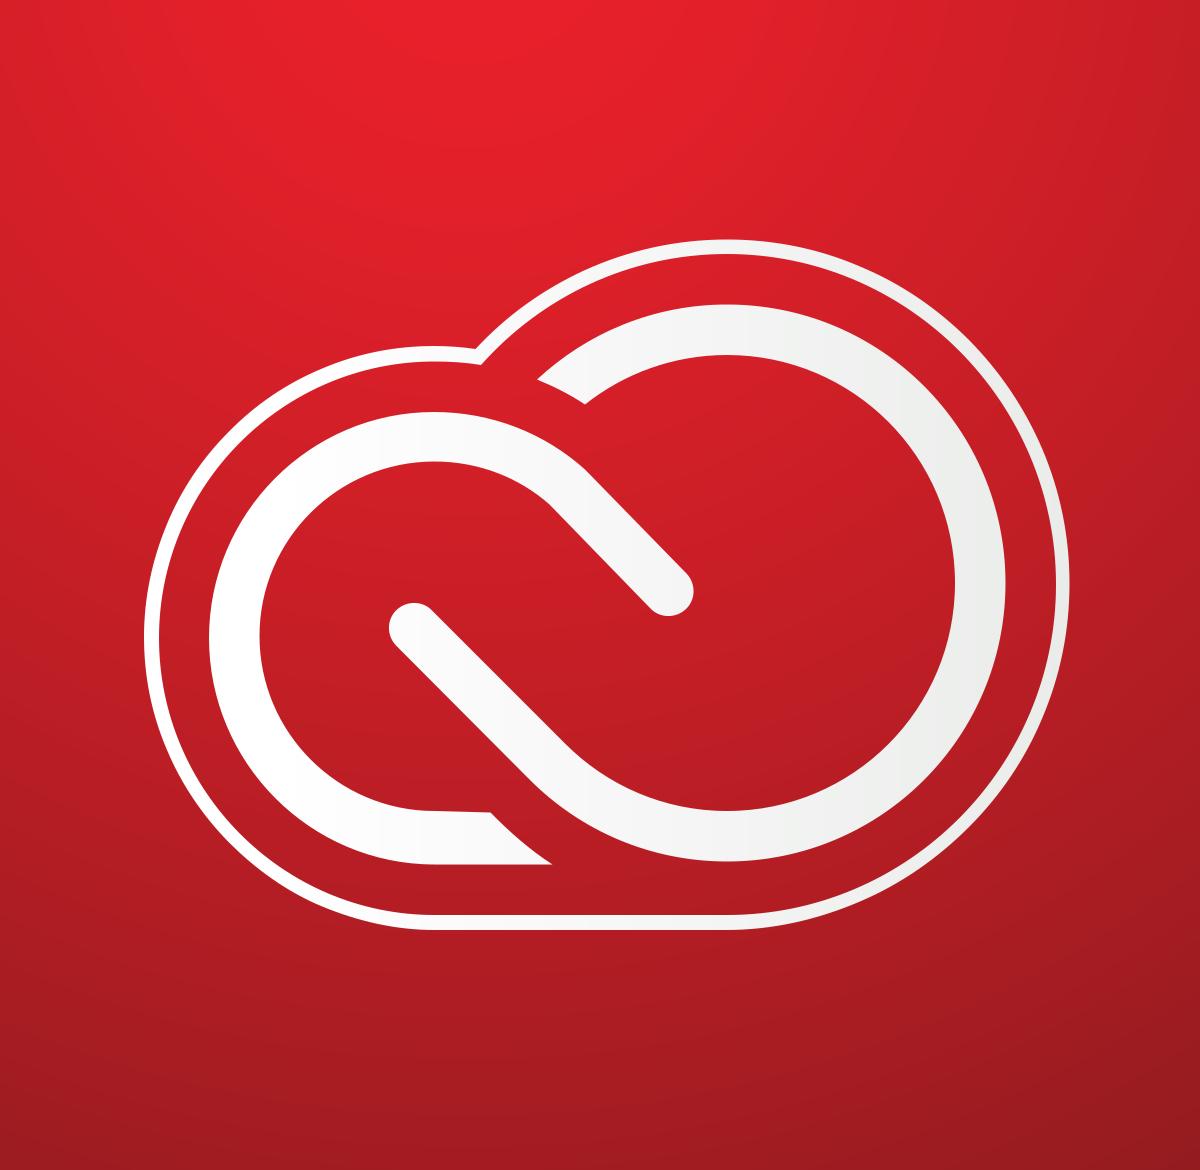 Adobe Creative Cloud Sale - £30.34pm for full Creative Cloud suite. Ends tomorrow.